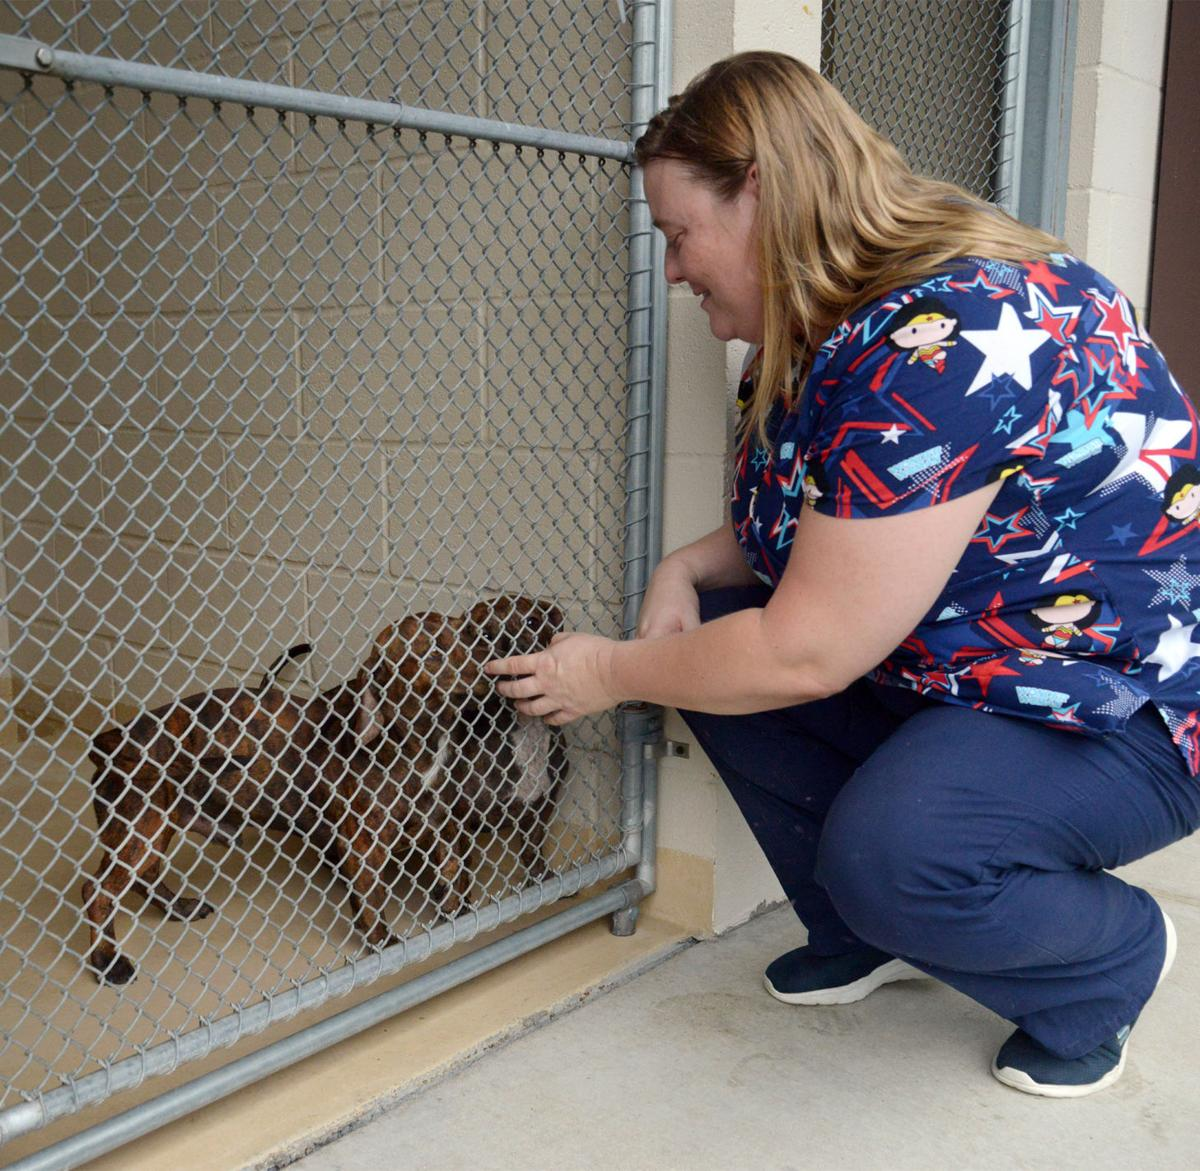 Kurth animal shelter